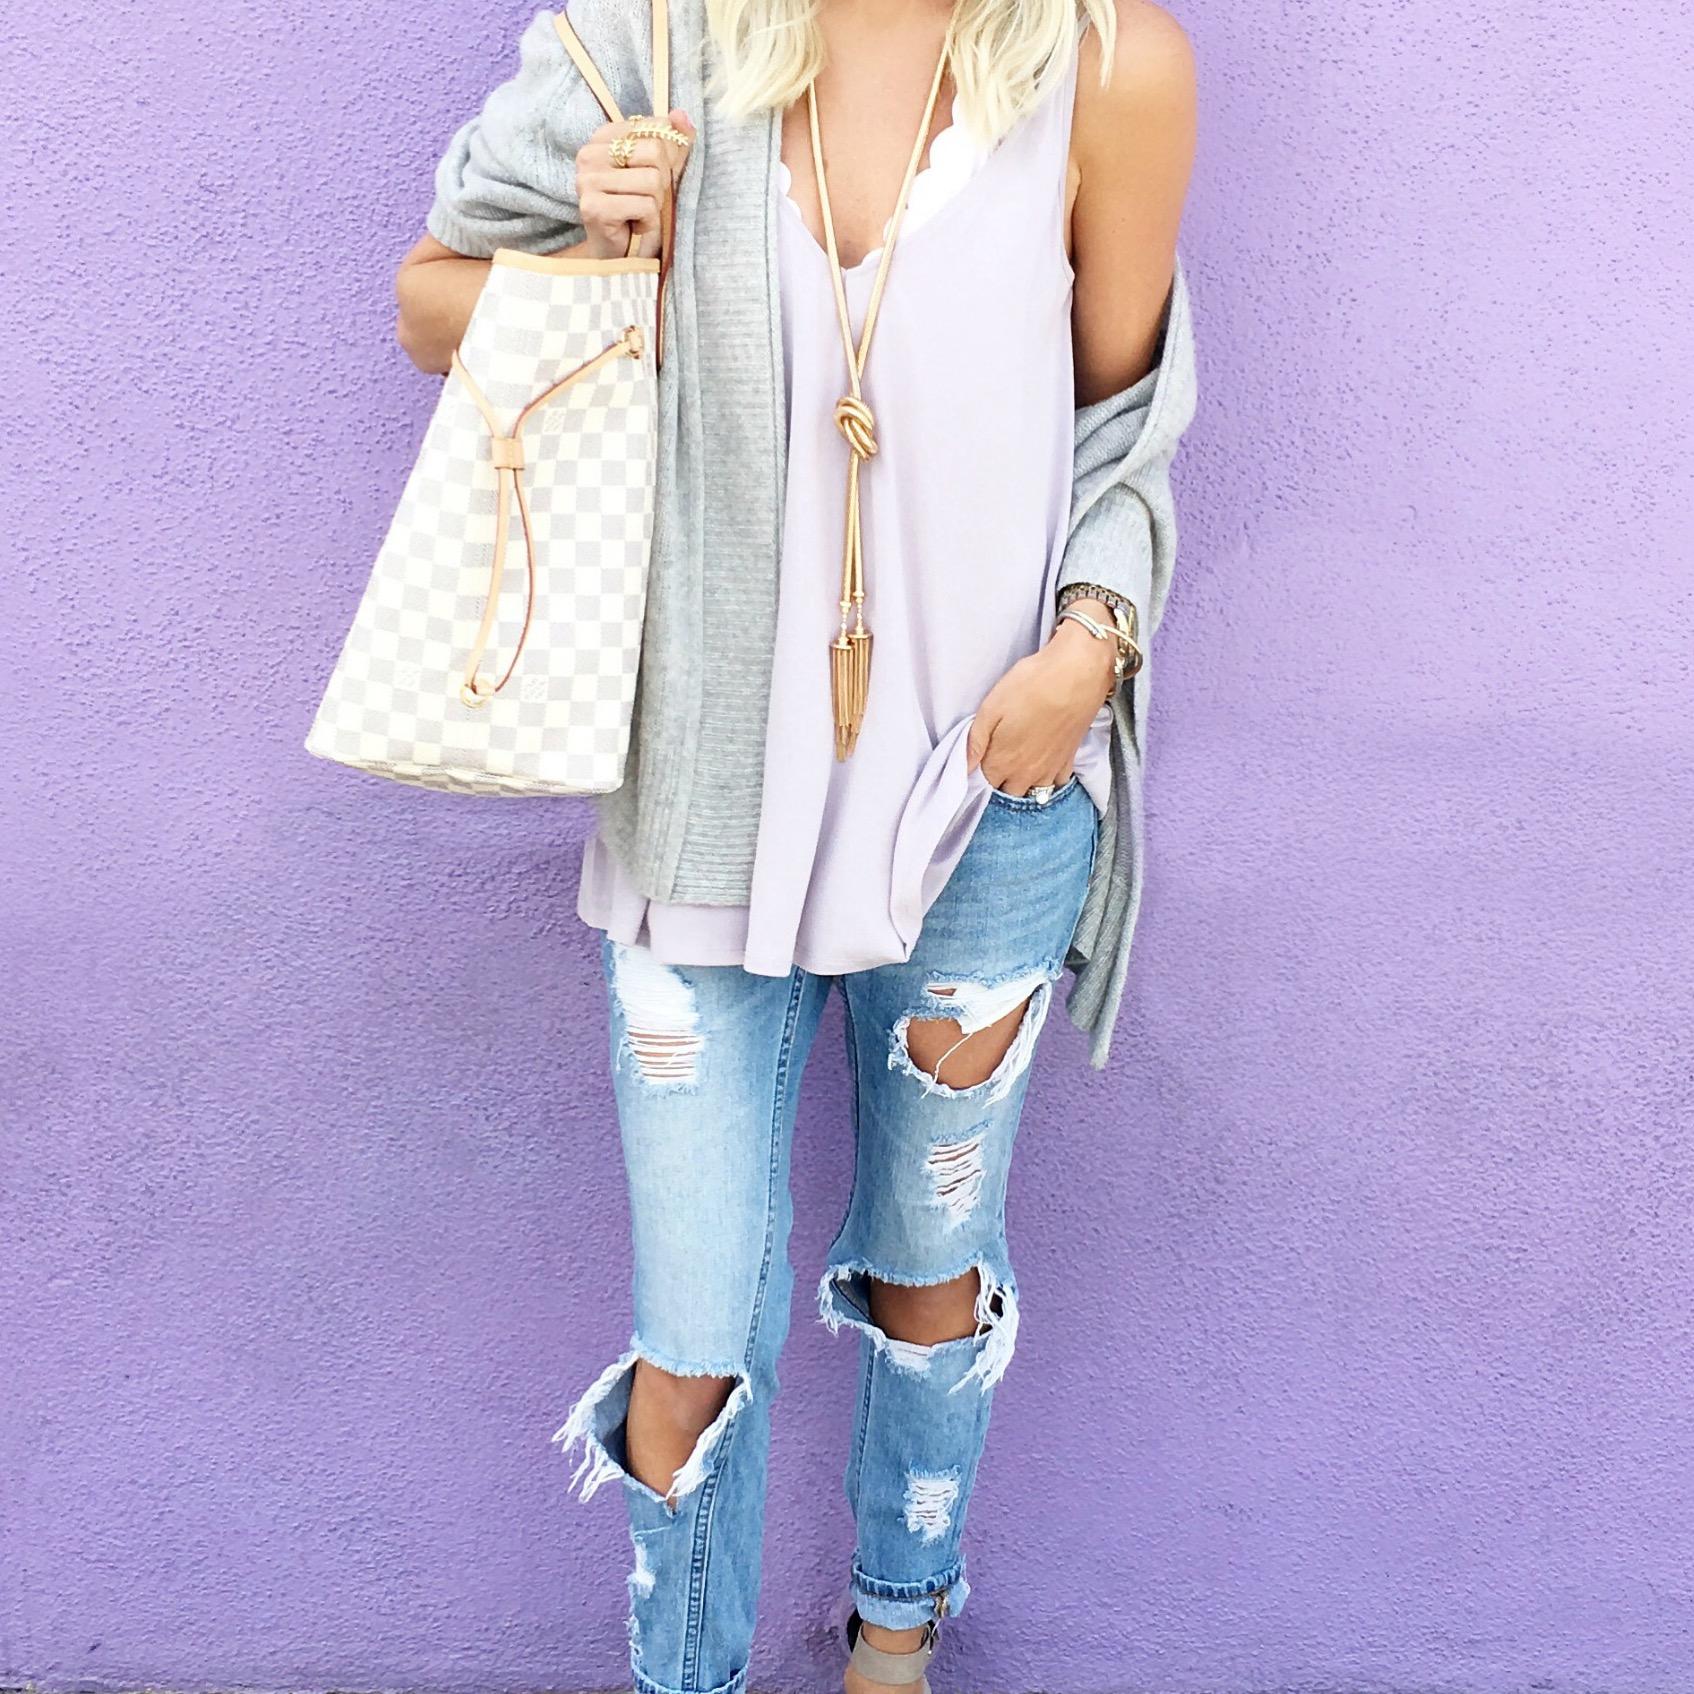 fcef23a26af Instagram Outfit Roundup - McKenna Bleu